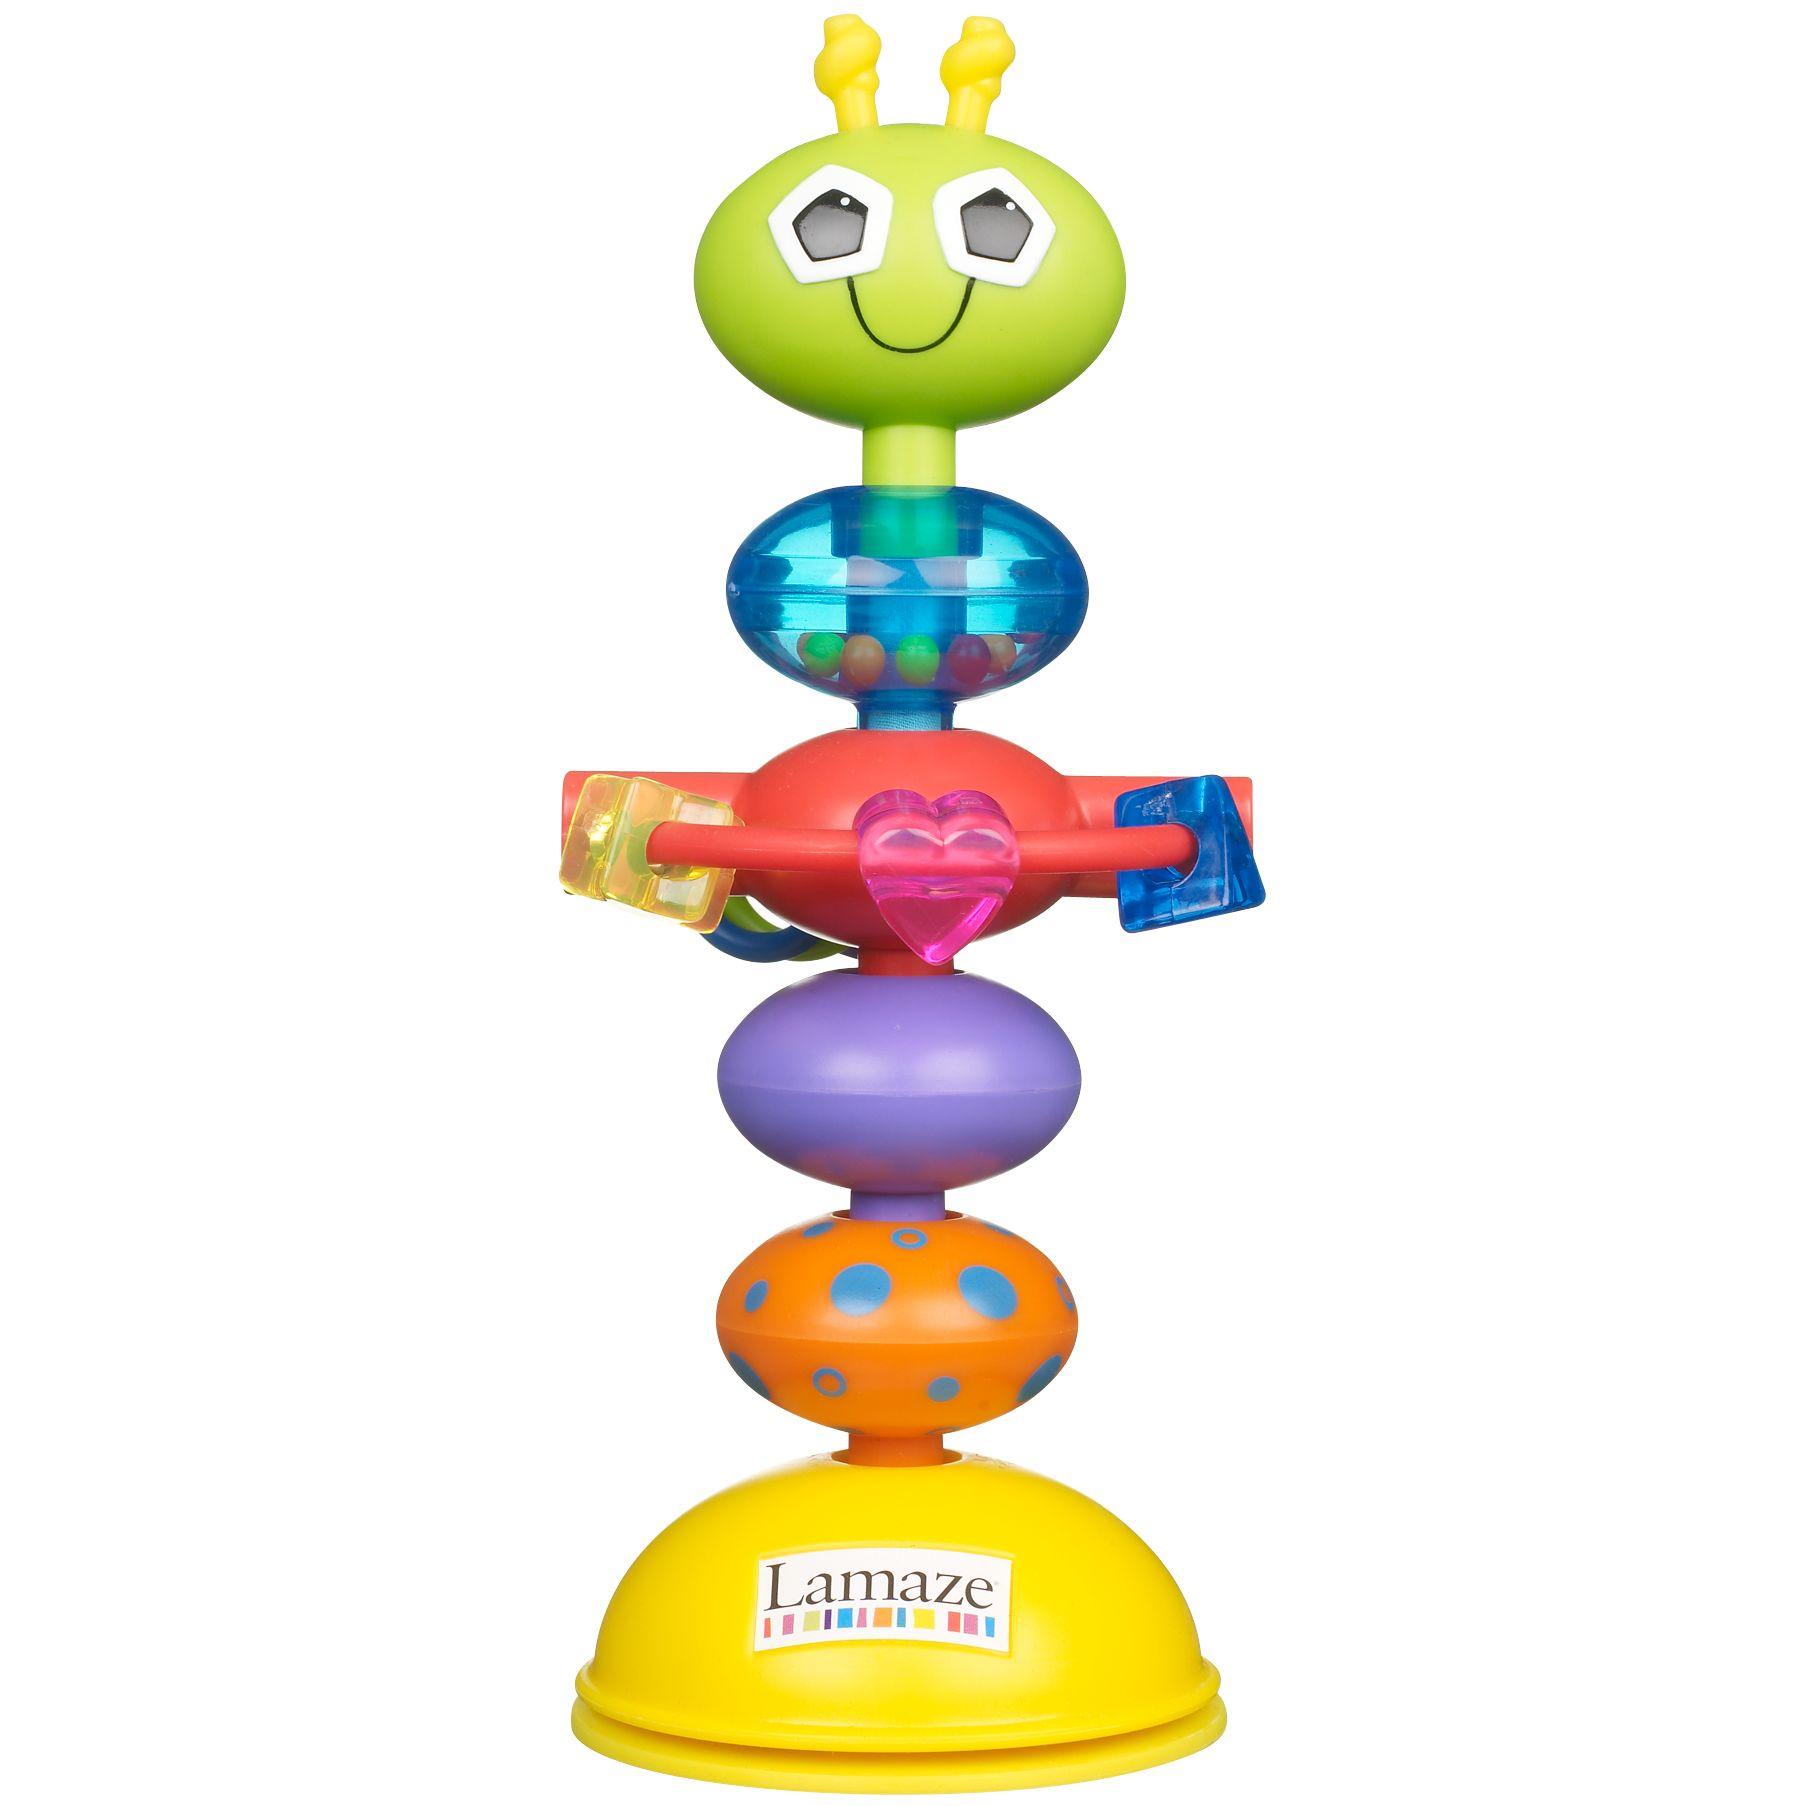 Lamaze Busy Bug Bendy Highchair Toy